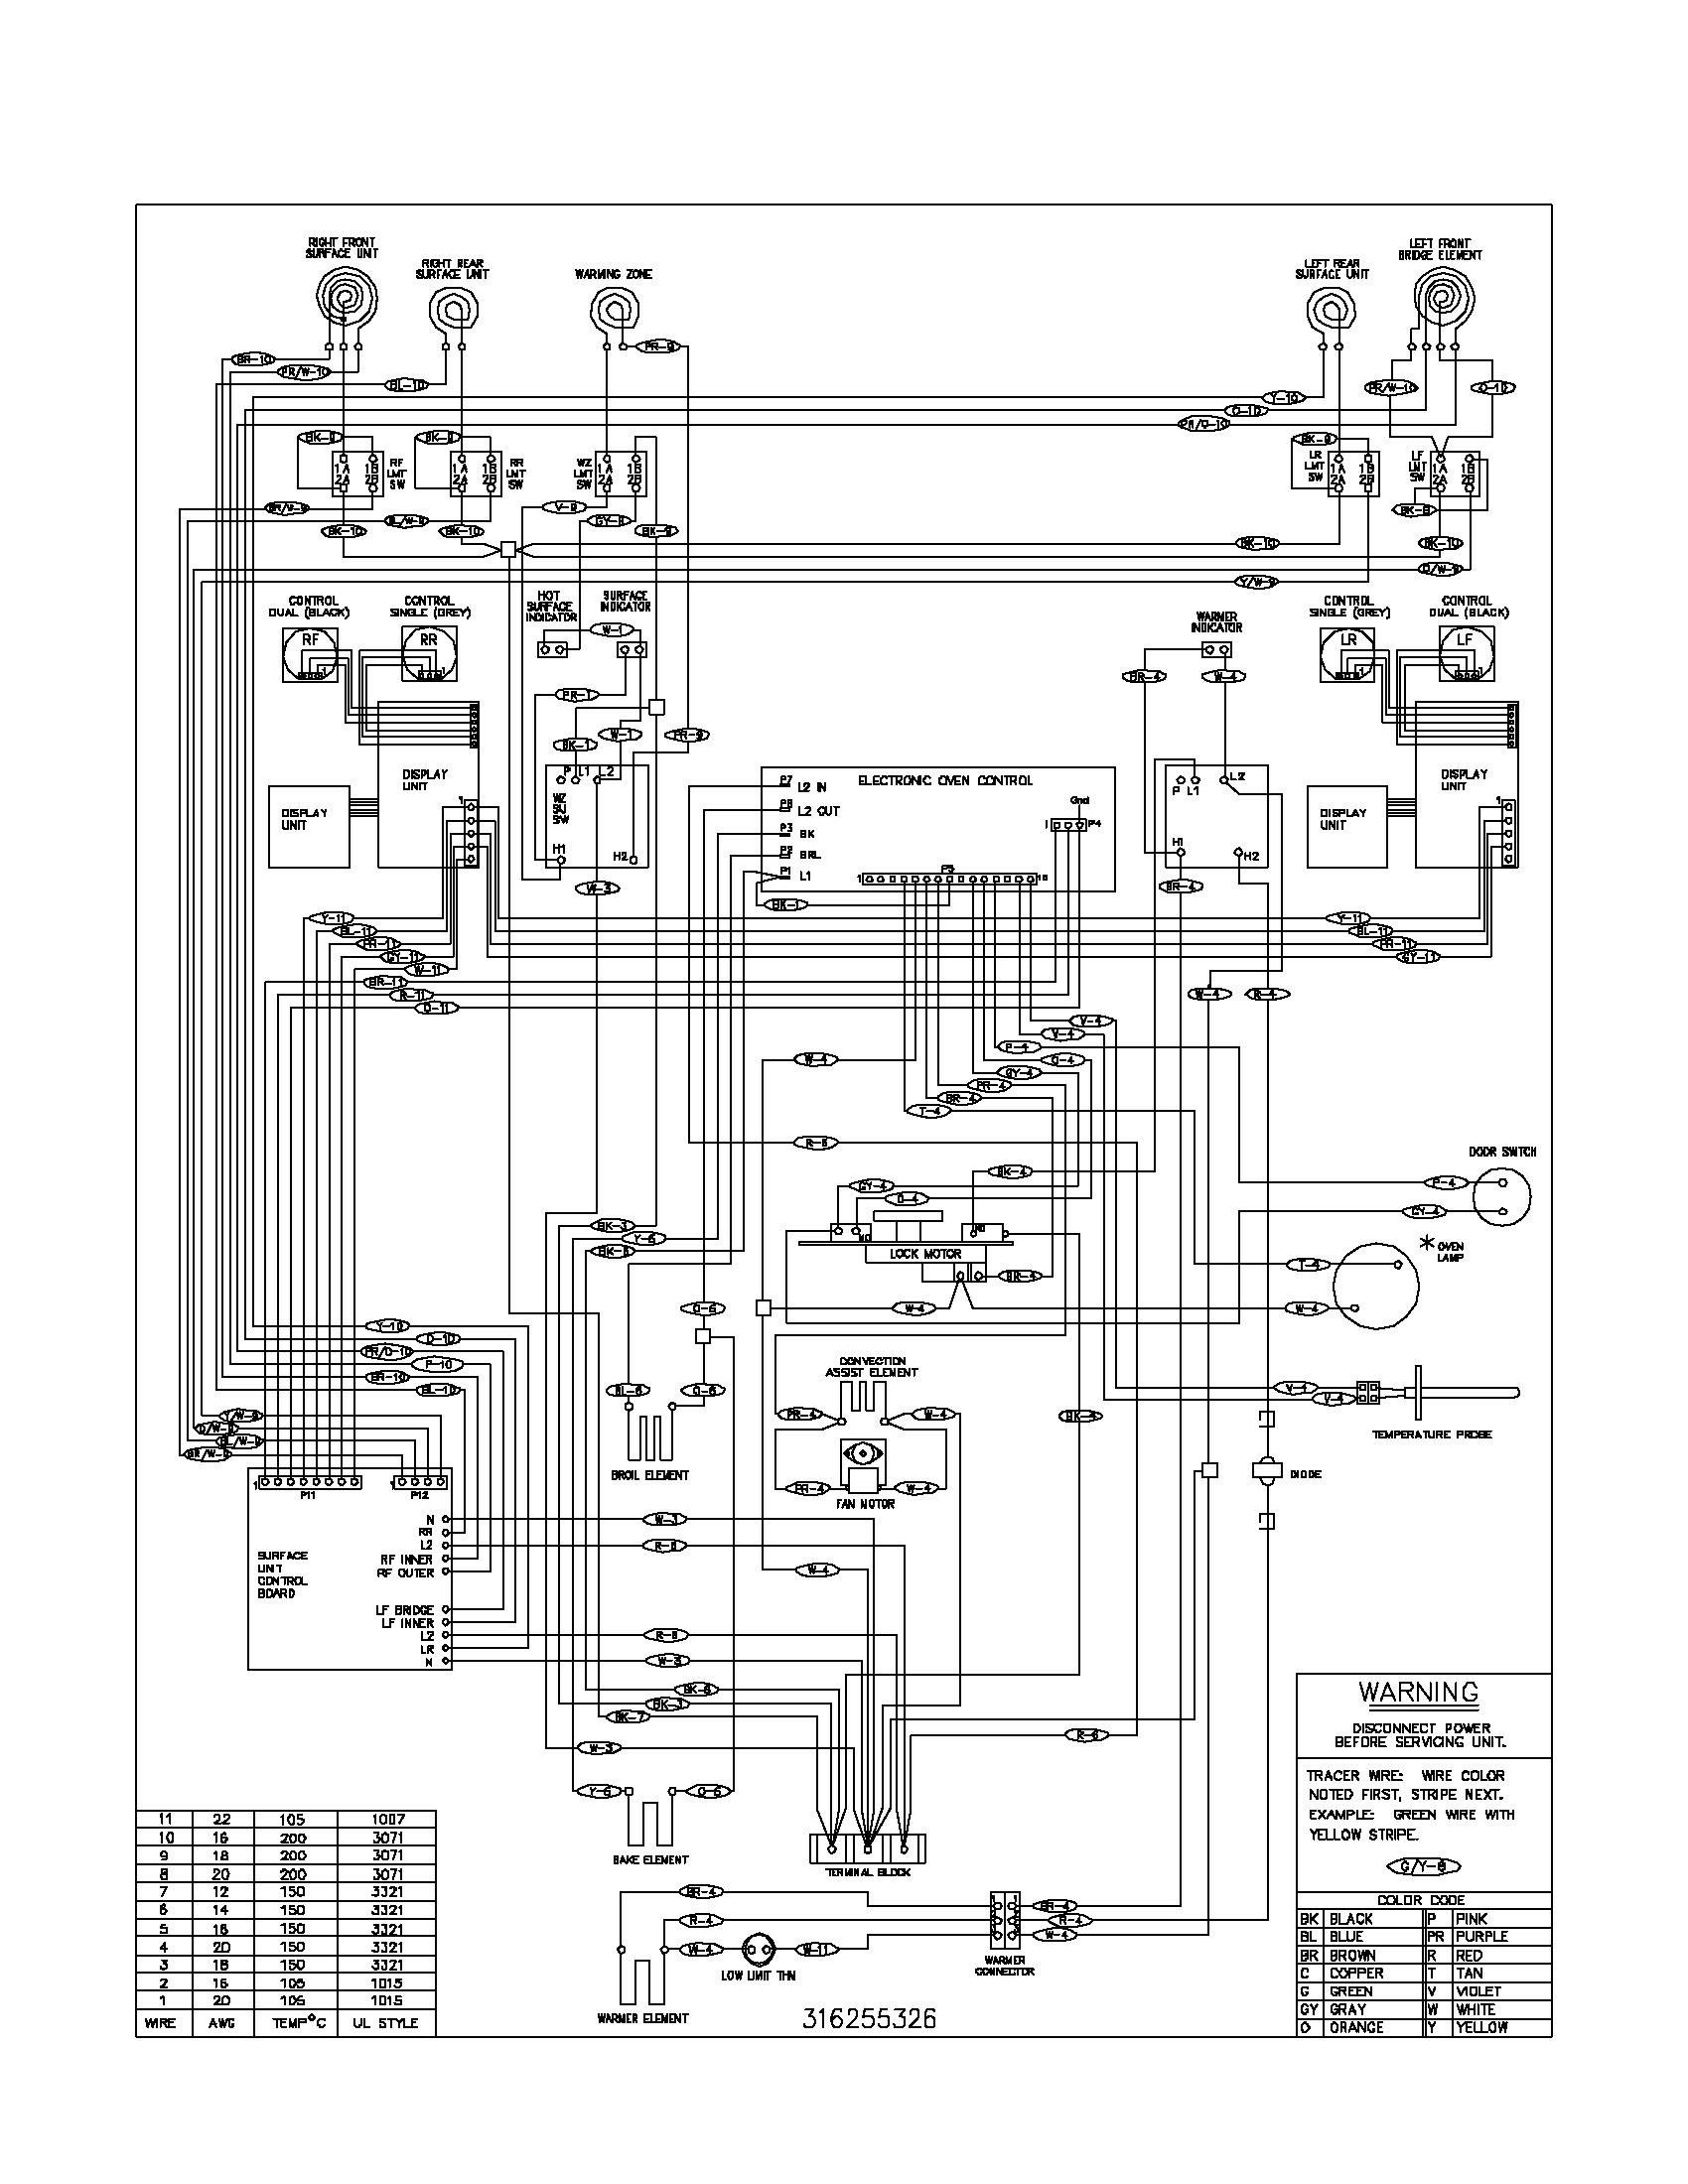 Frigidaire Wall Oven Wiring Schematic - Smart Fortwo Wiring Diagram Pdf for Wiring  Diagram SchematicsWiring Diagram Schematics